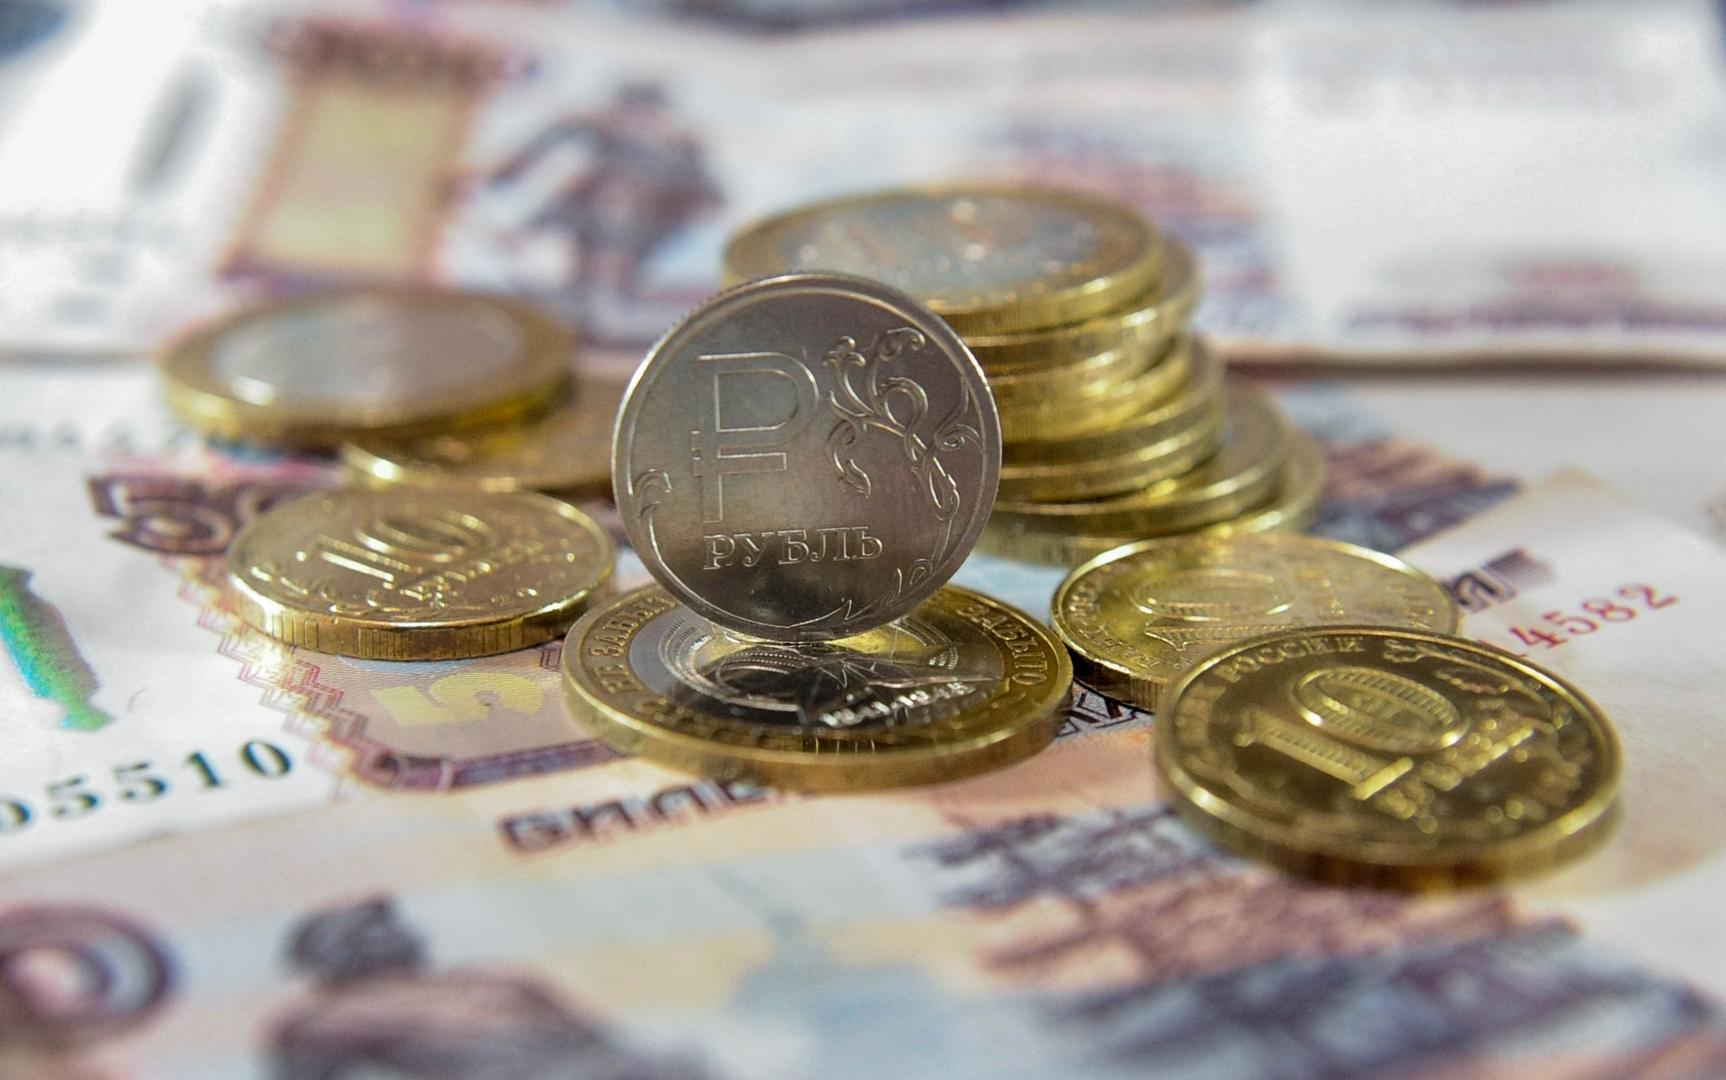 Законопроект о зарплатах в вузах готовится в Госдуме